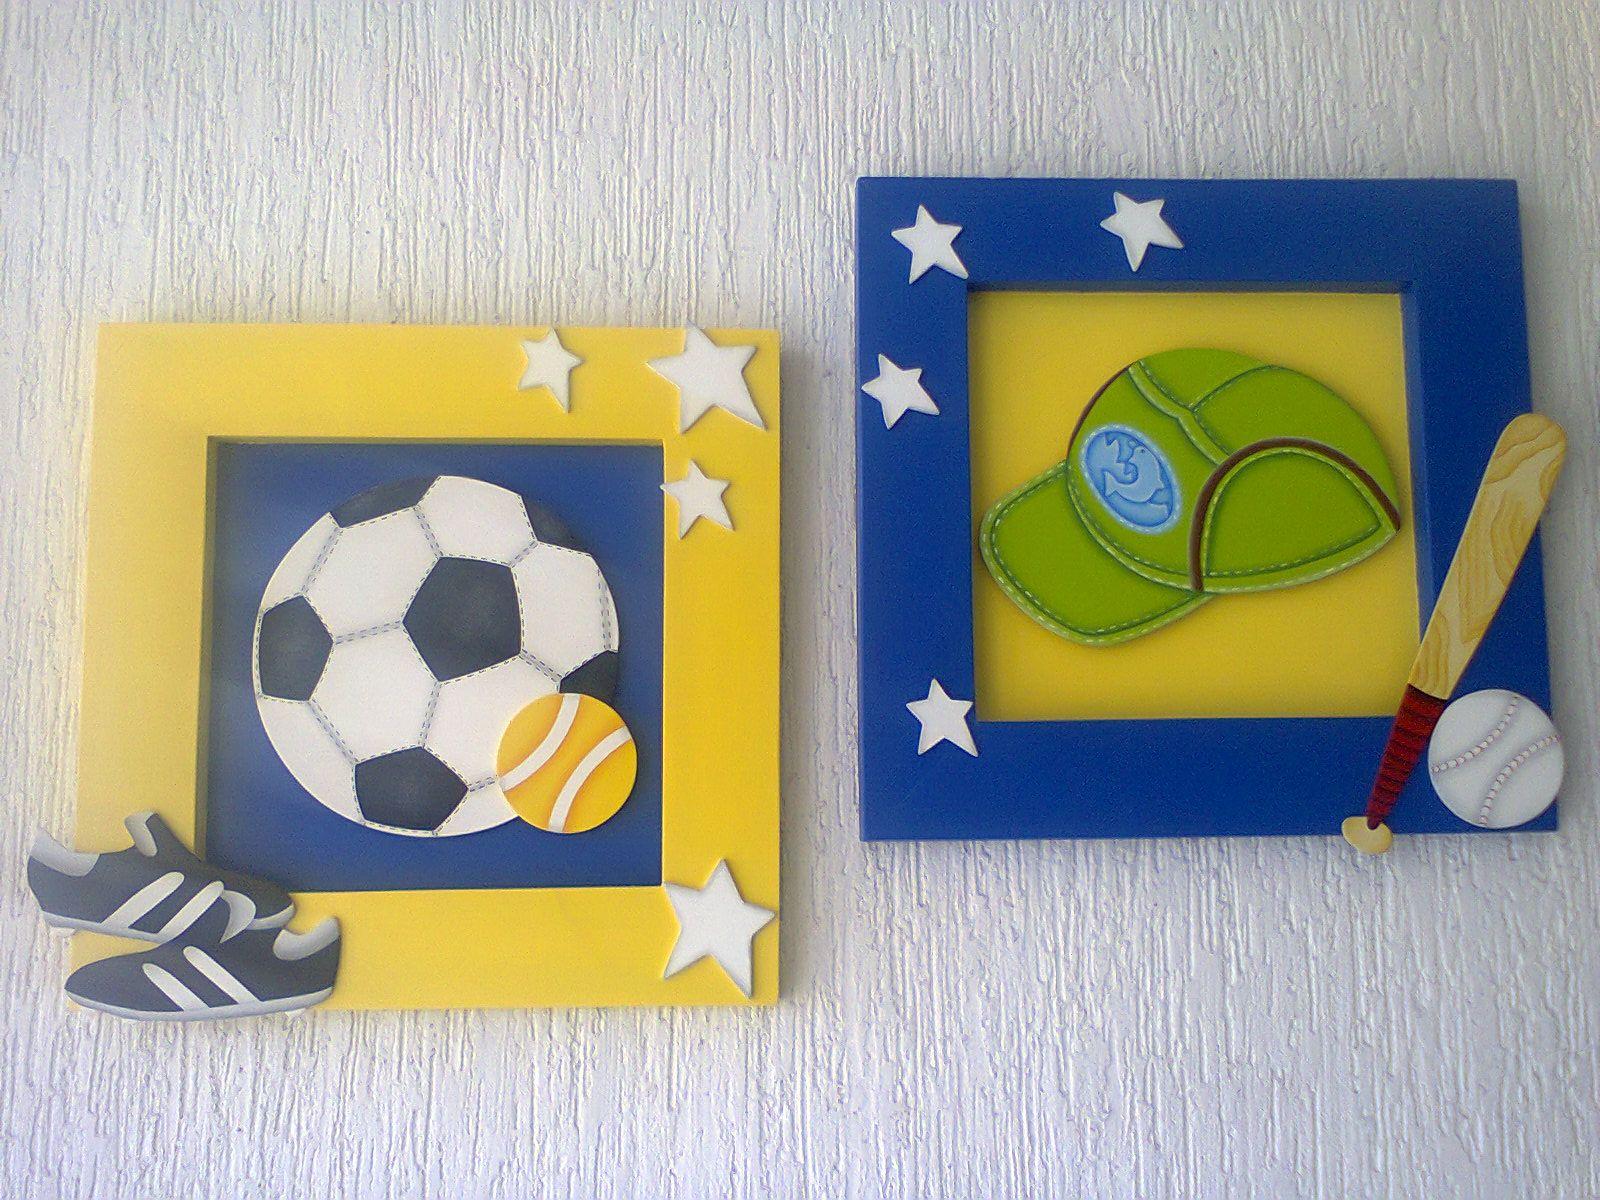 Aventuras country cuadros infantiles ni os pinterest - Cuadros habitaciones infantiles ...